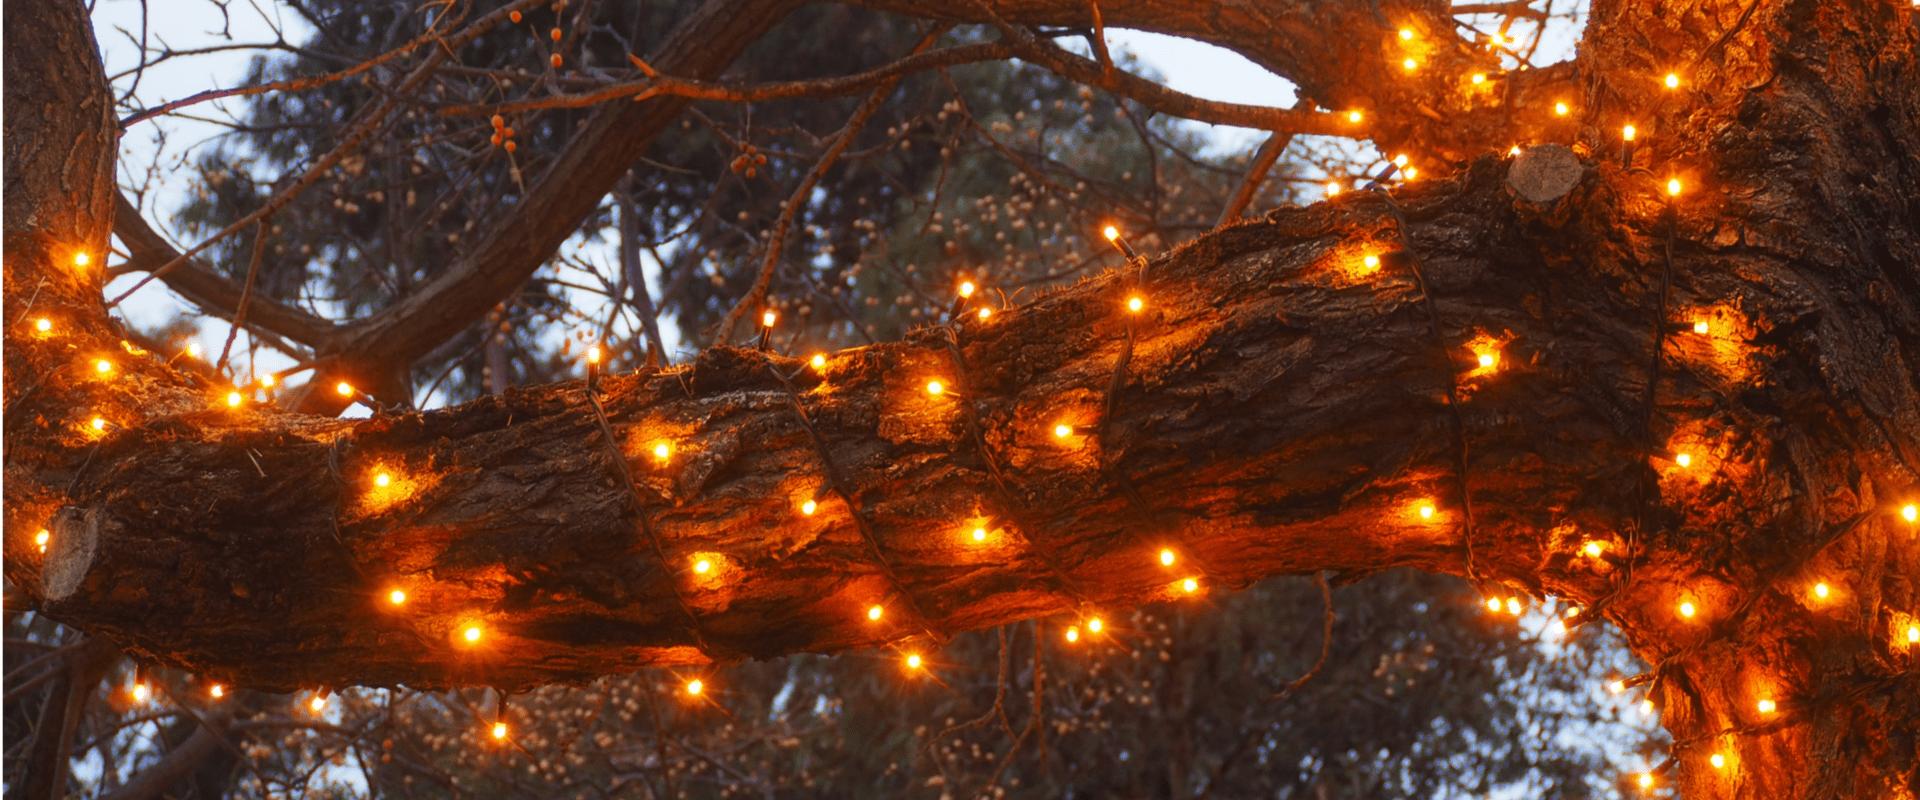 Bright lights on a tree